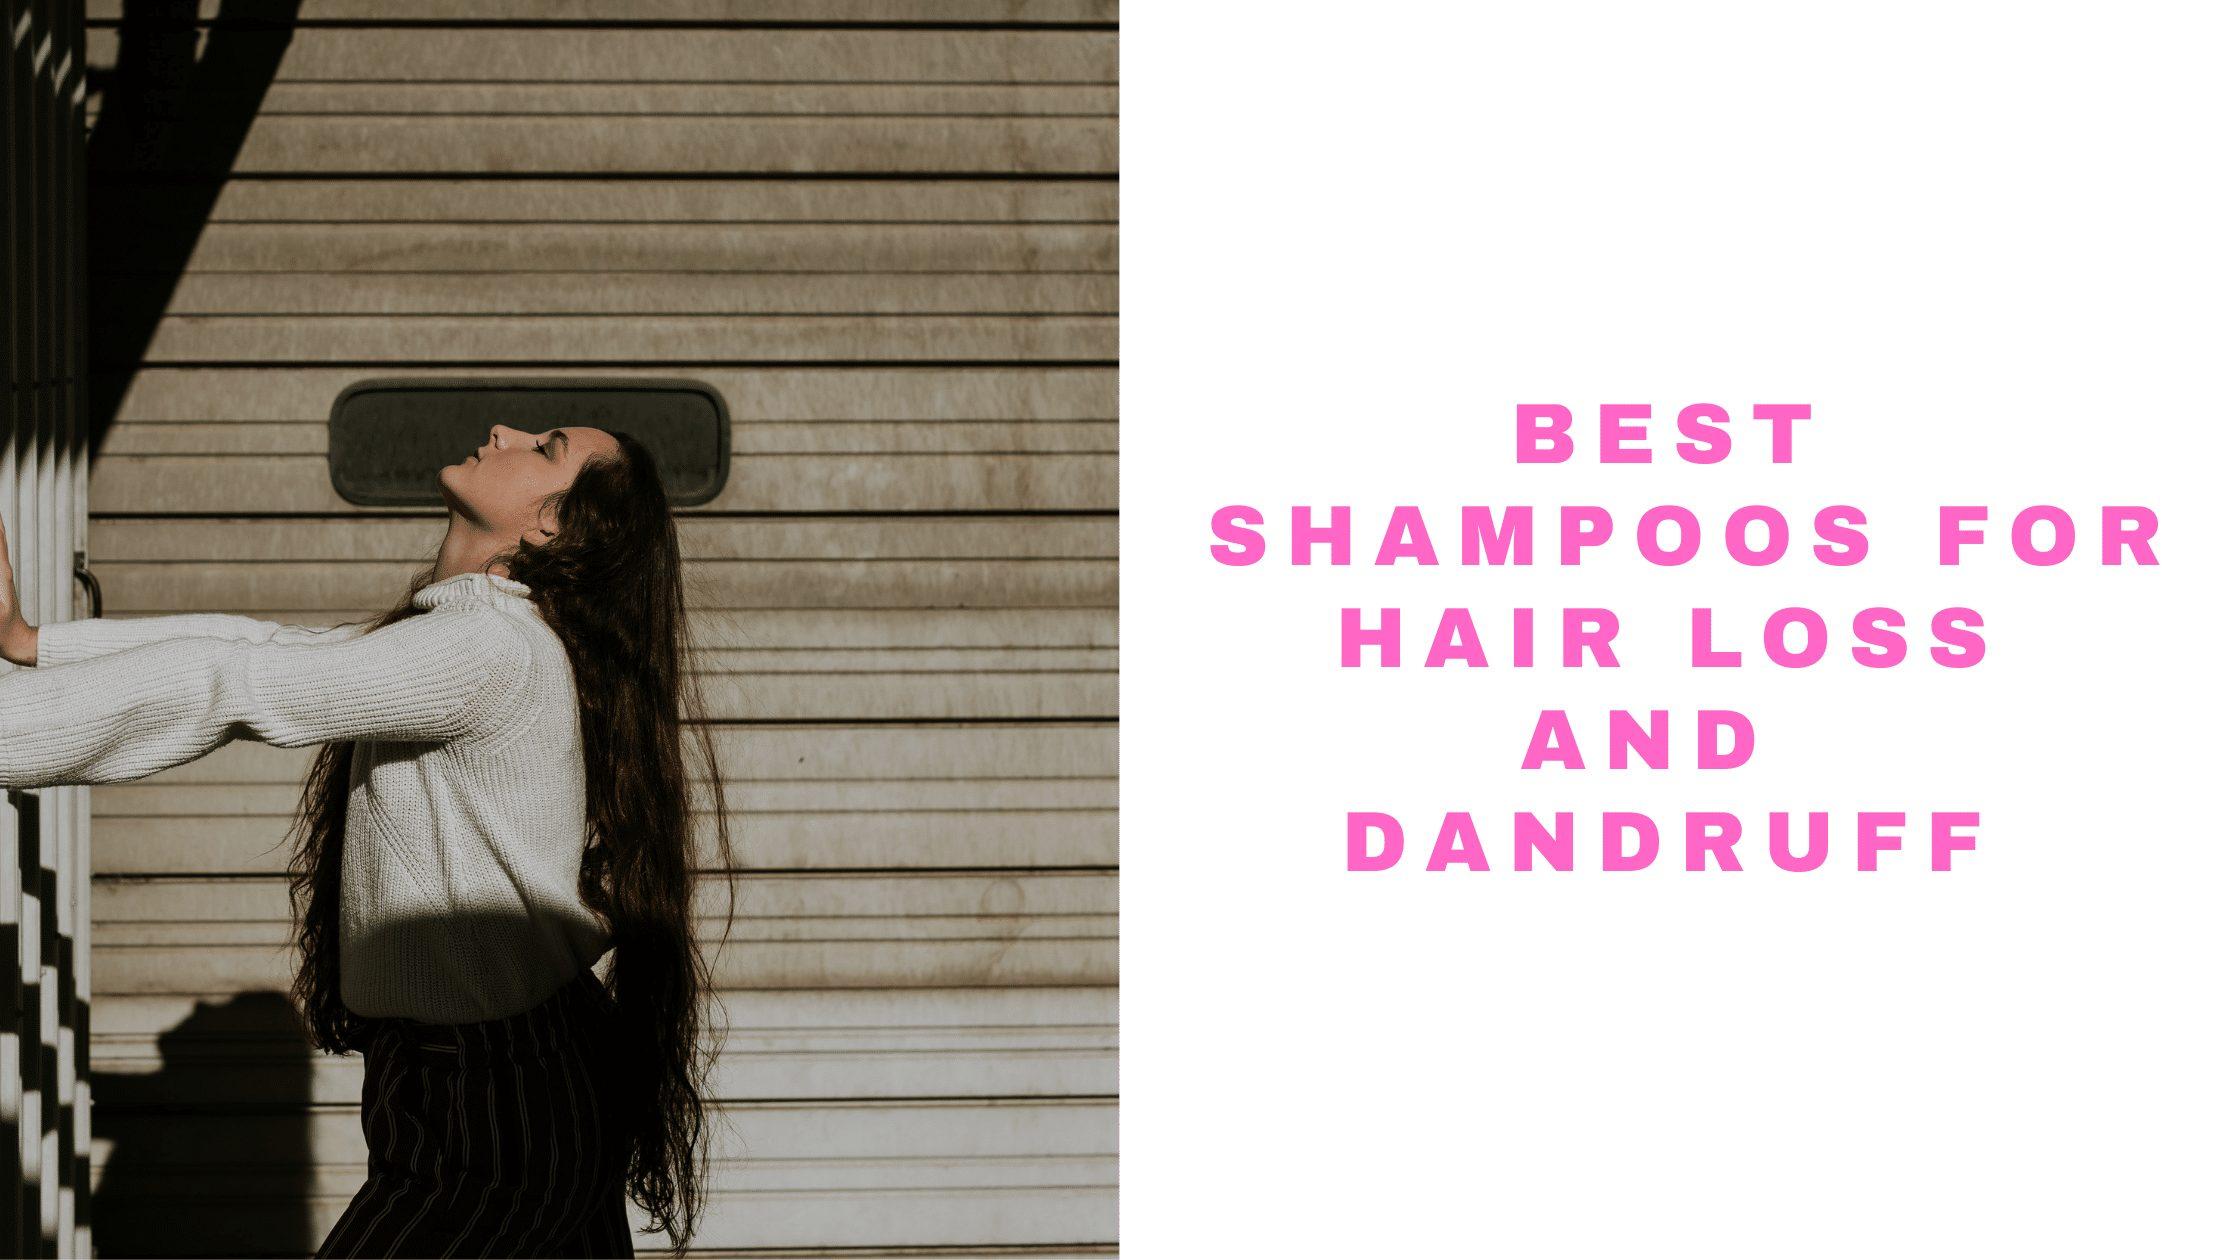 Best Herbal Shampoo For Hair Loss And Dandruff 2021